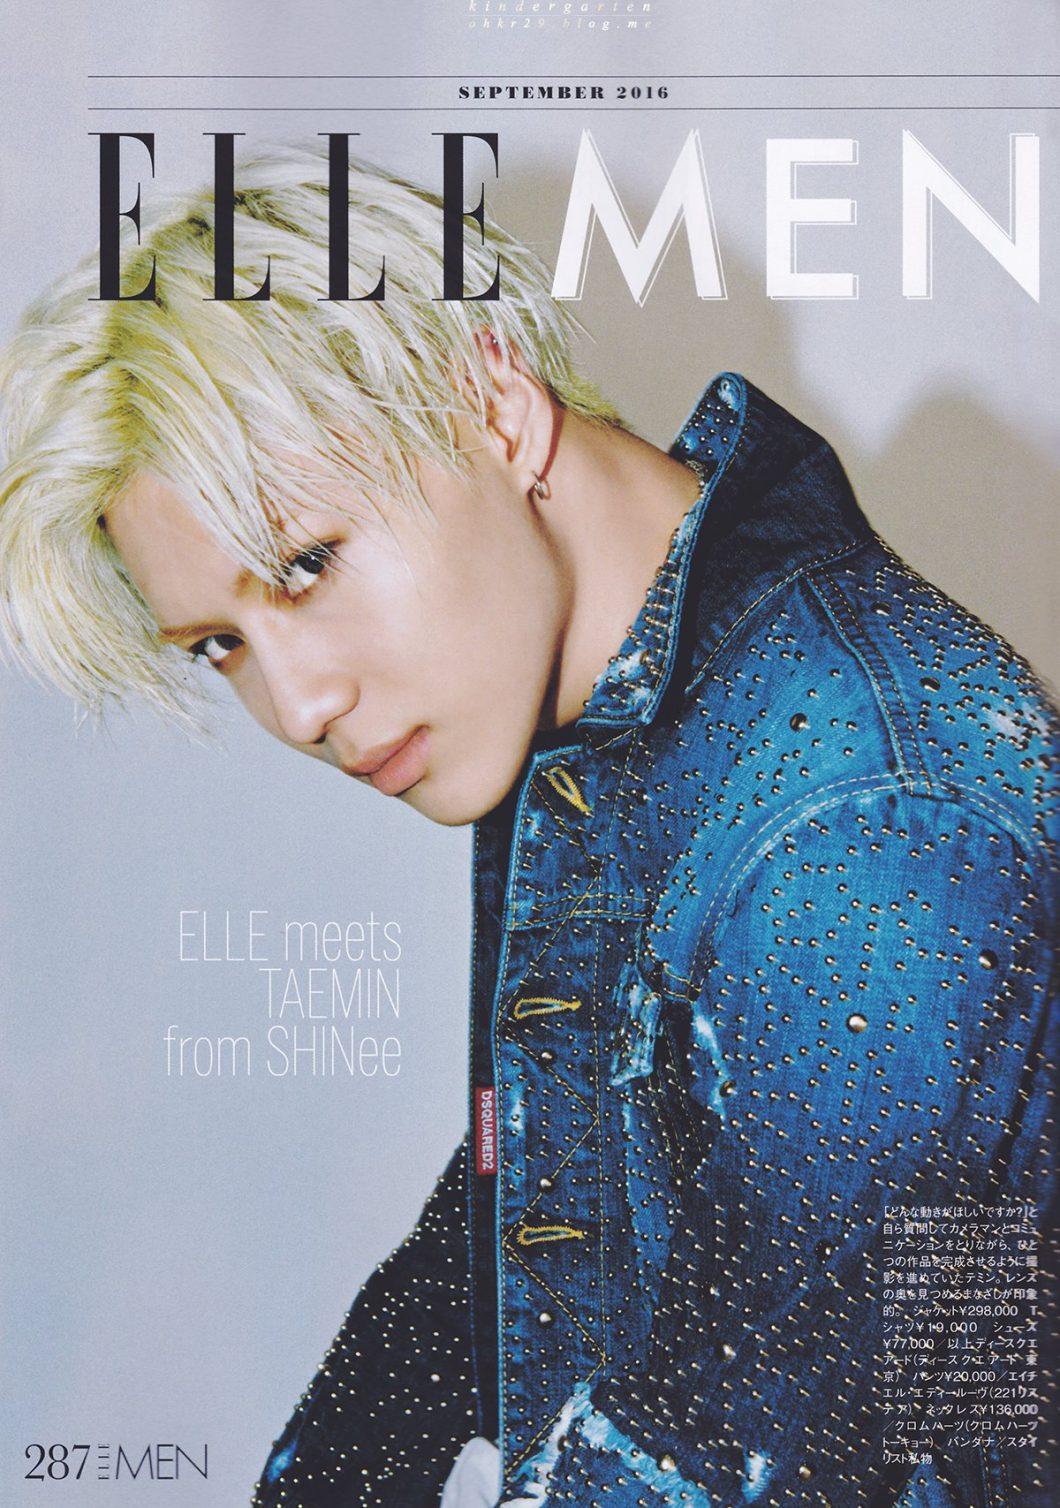 taemin-2016-japanese-magazine18